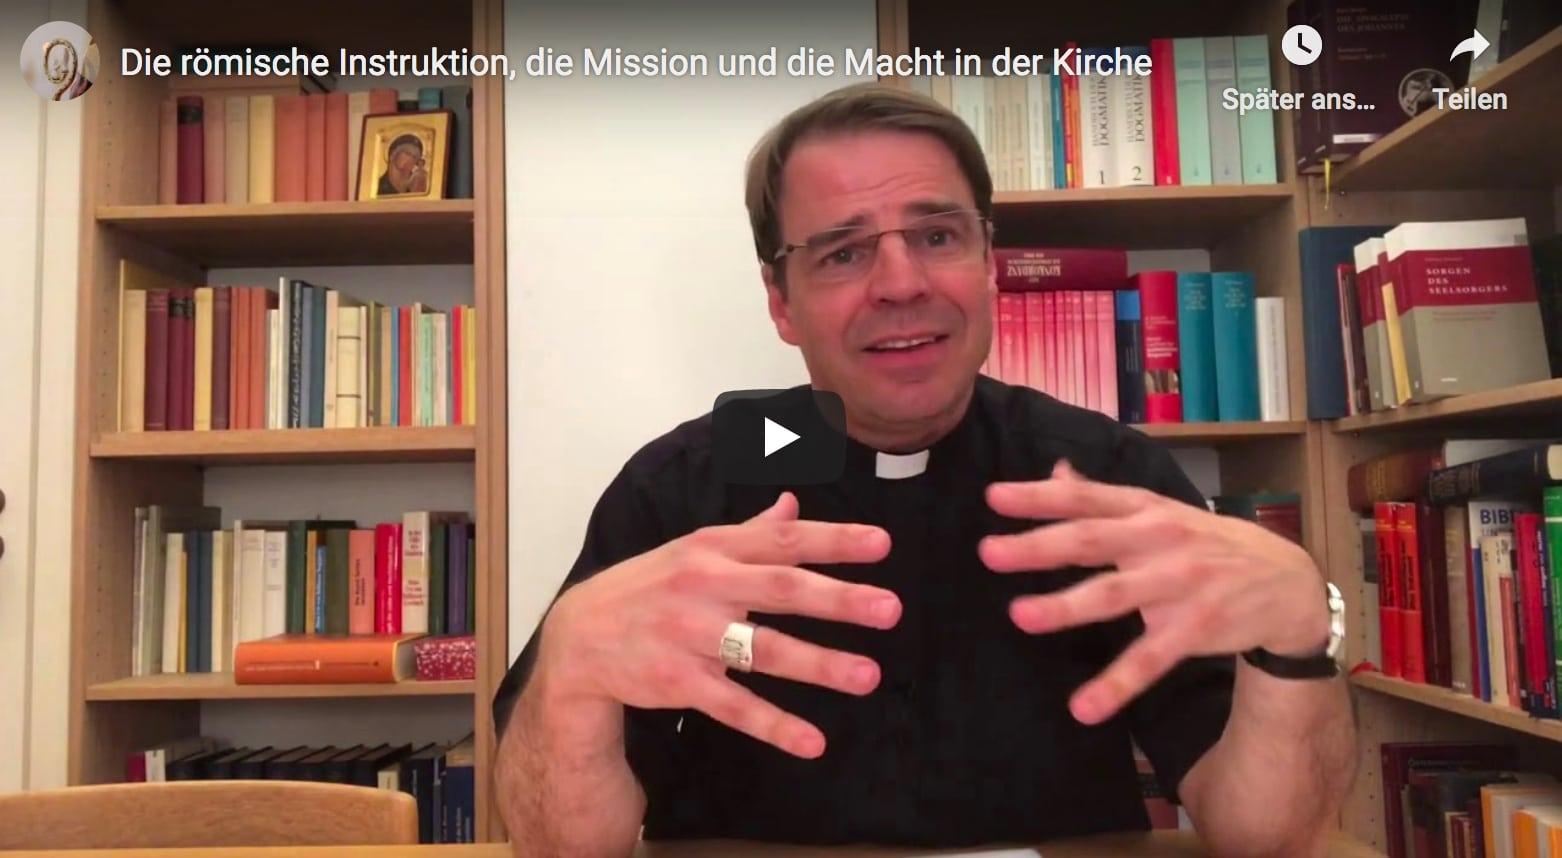 Instruktion Der Kleruskongregation